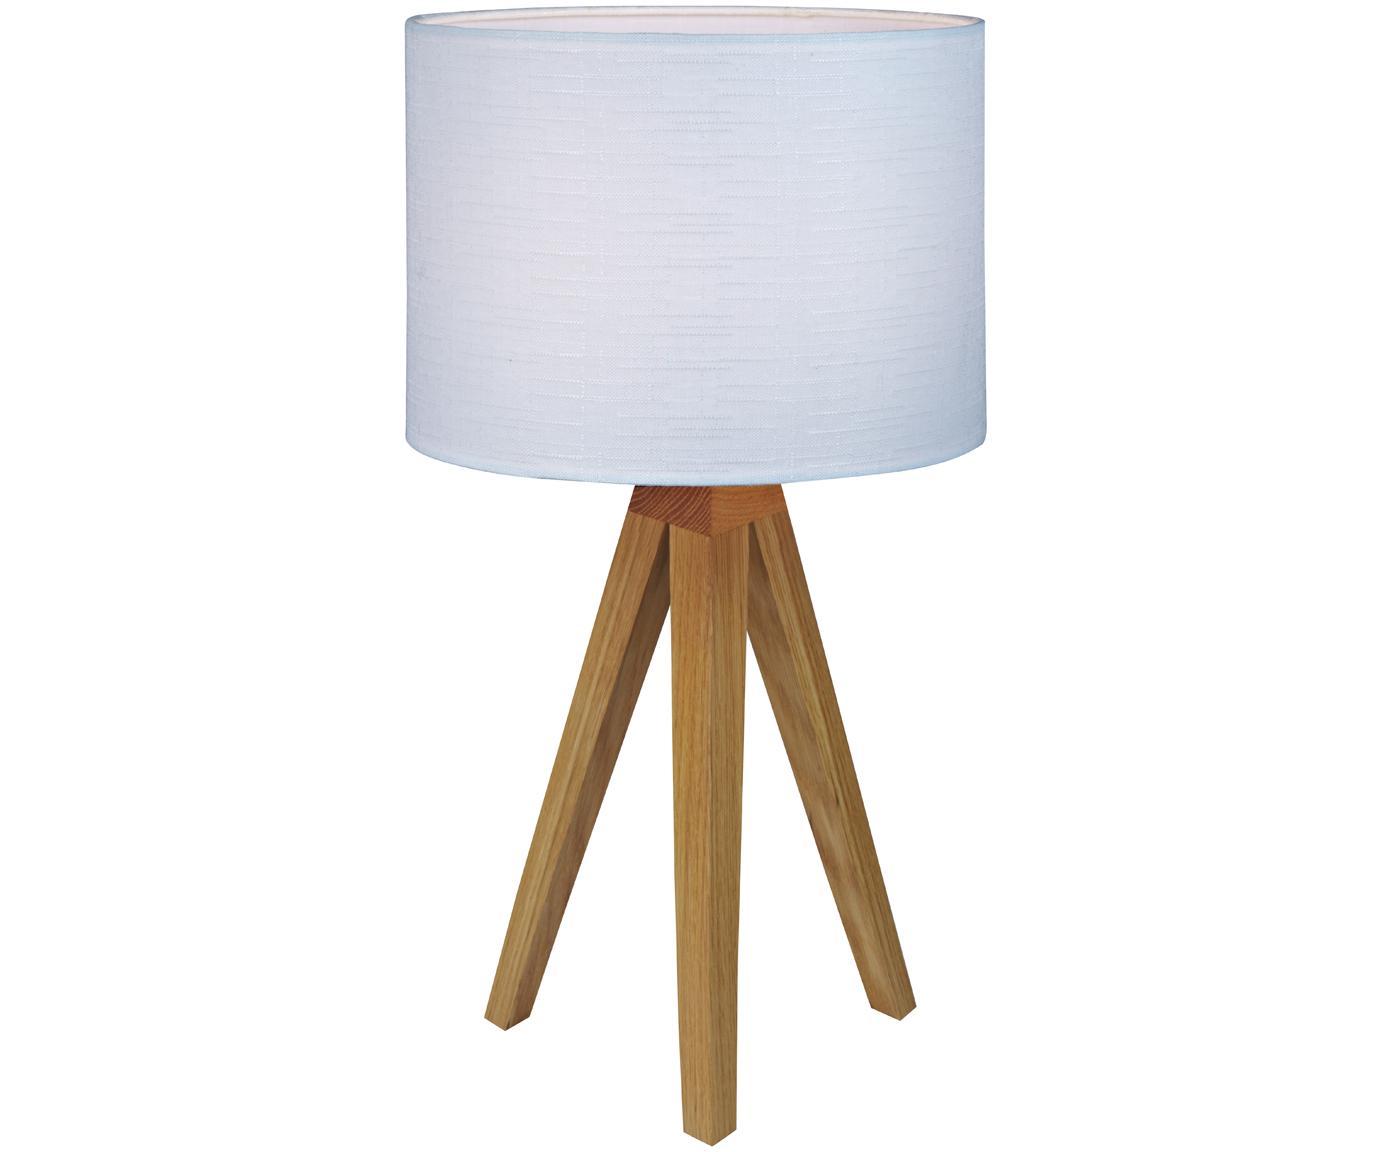 Lámpara de mesa de madera Kullen, Pantalla: poliéster, Roble, blanco, Ø 23 x Al 44 cm